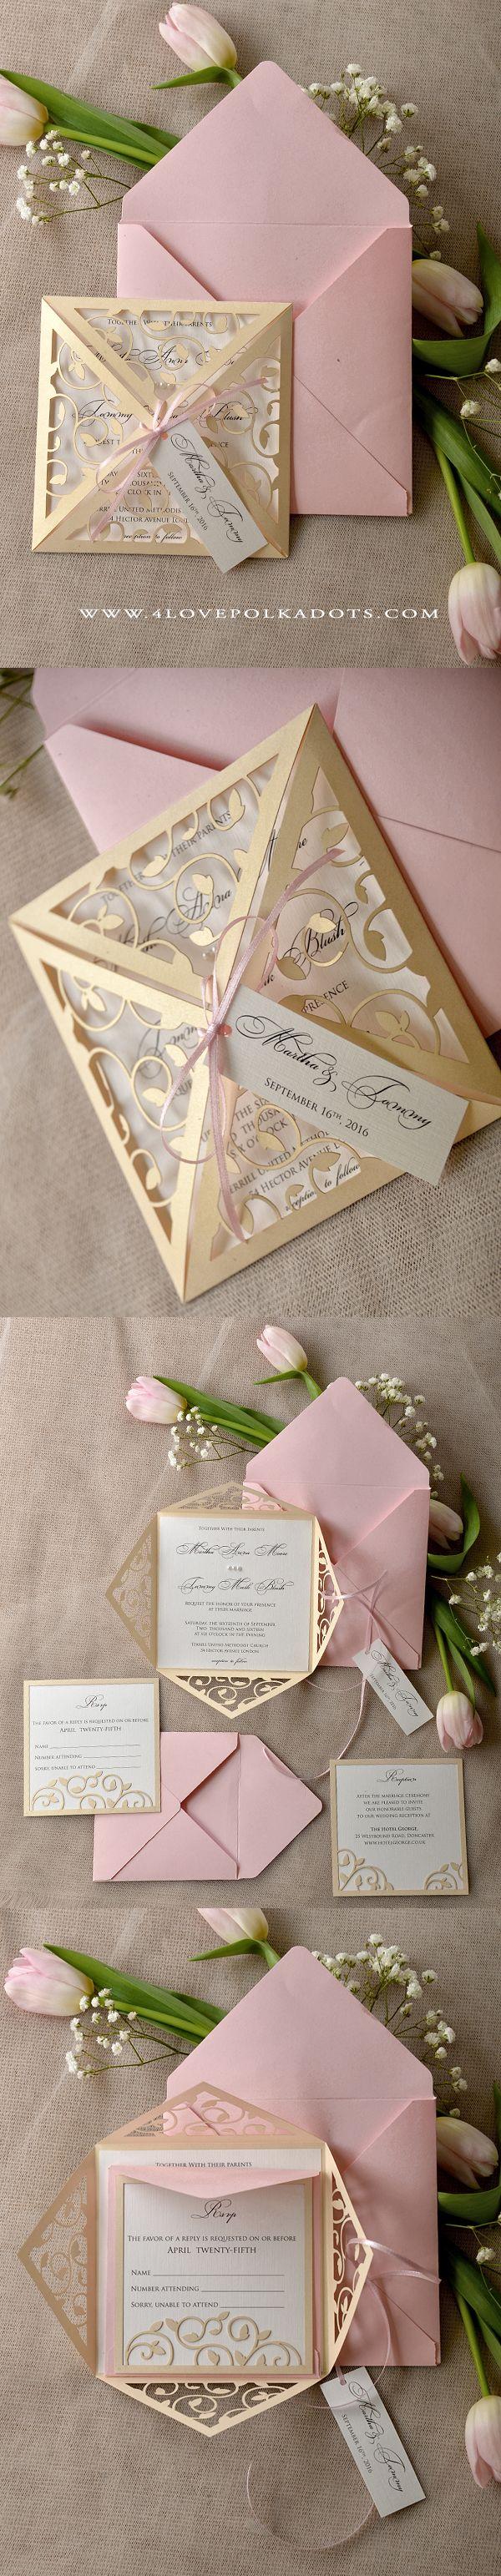 cinderellthemed wedding scroll invitations%0A Best     Handmade invitation cards ideas on Pinterest   Handmade wedding  invitations  Hot air ballon diy and E invitations